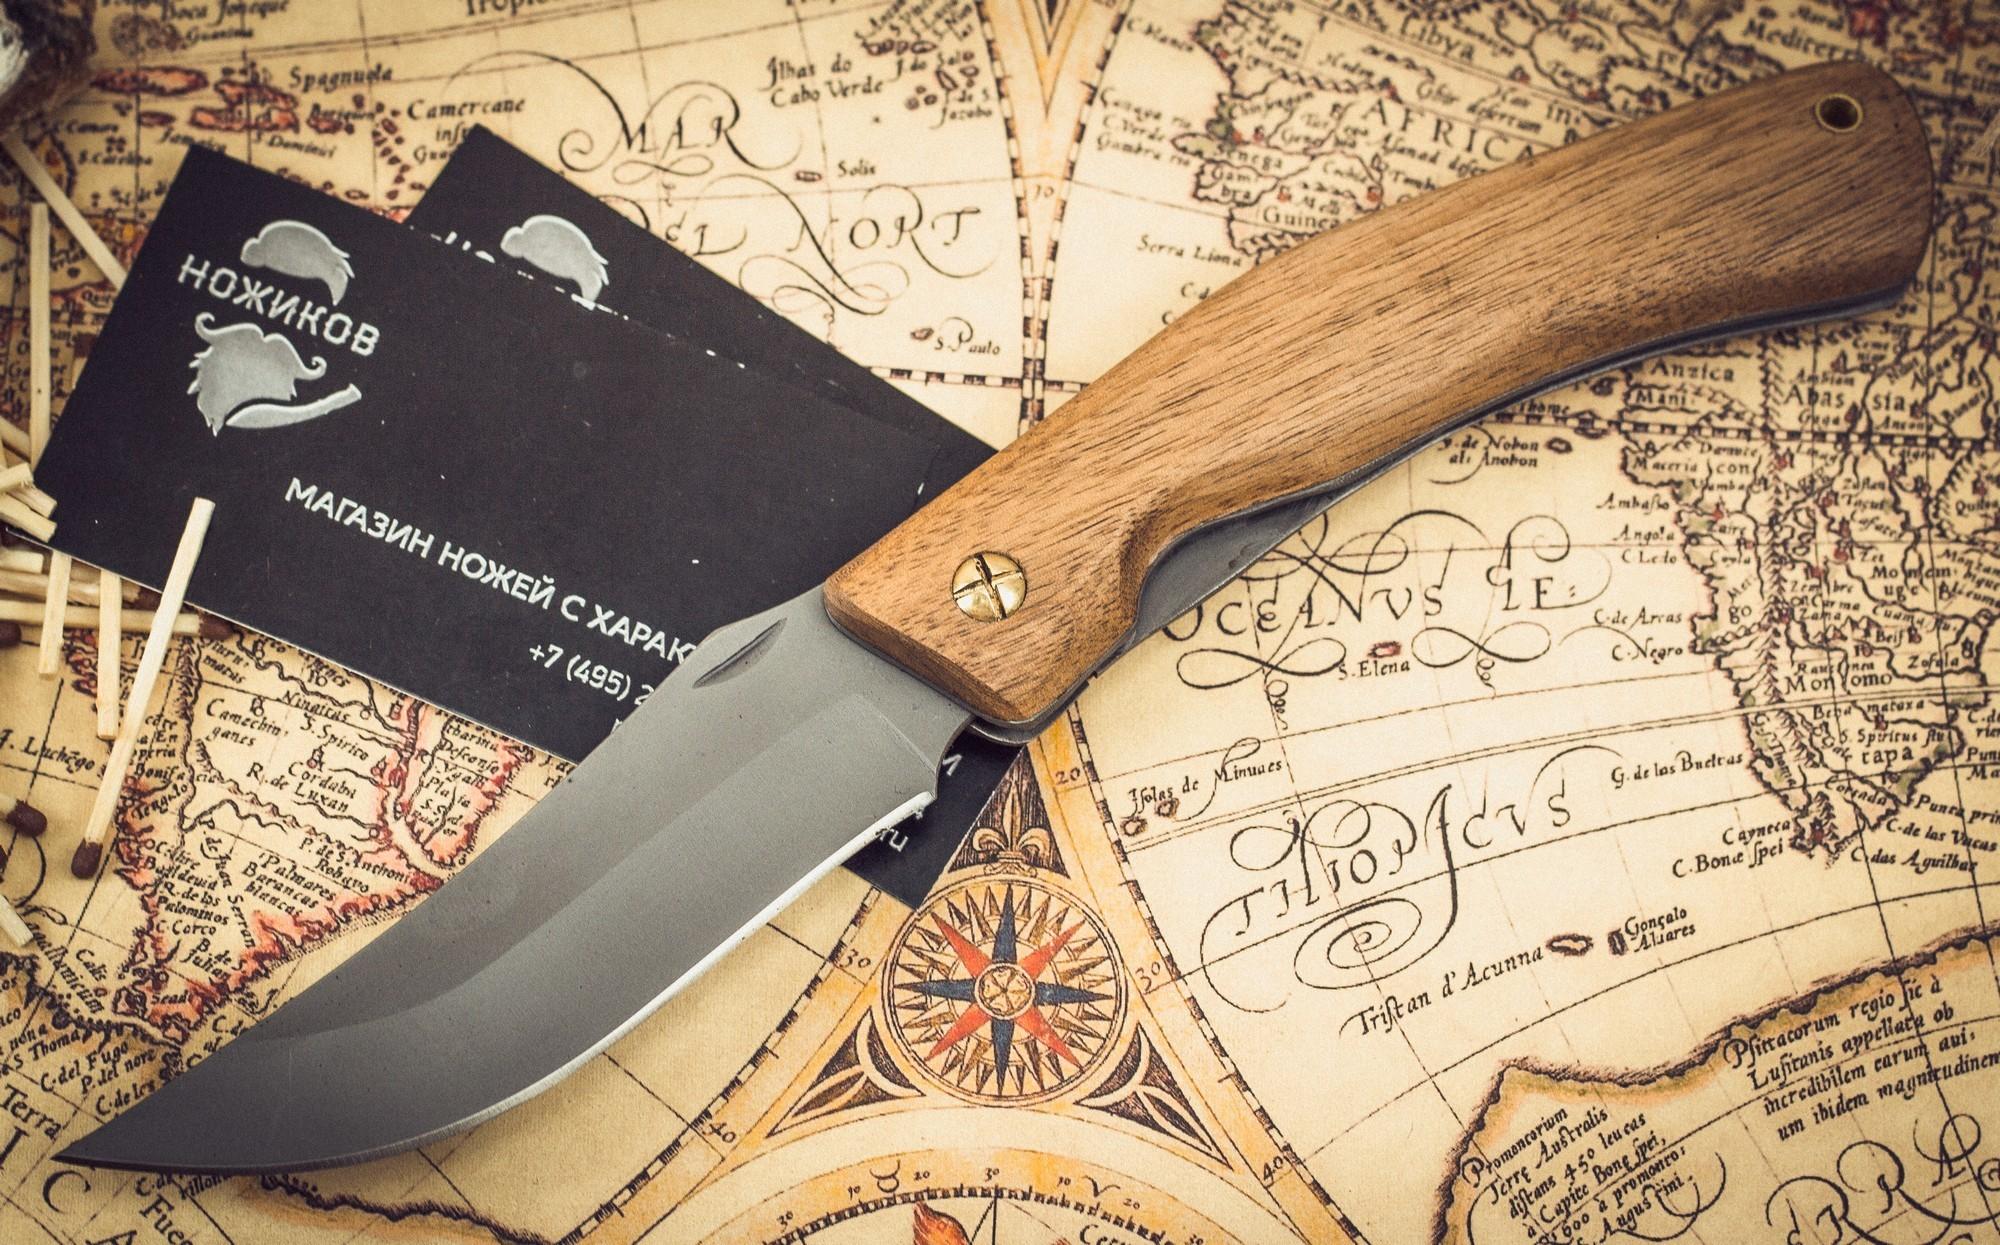 Складные ножи Косач , сталь 95Х18 от Марычев